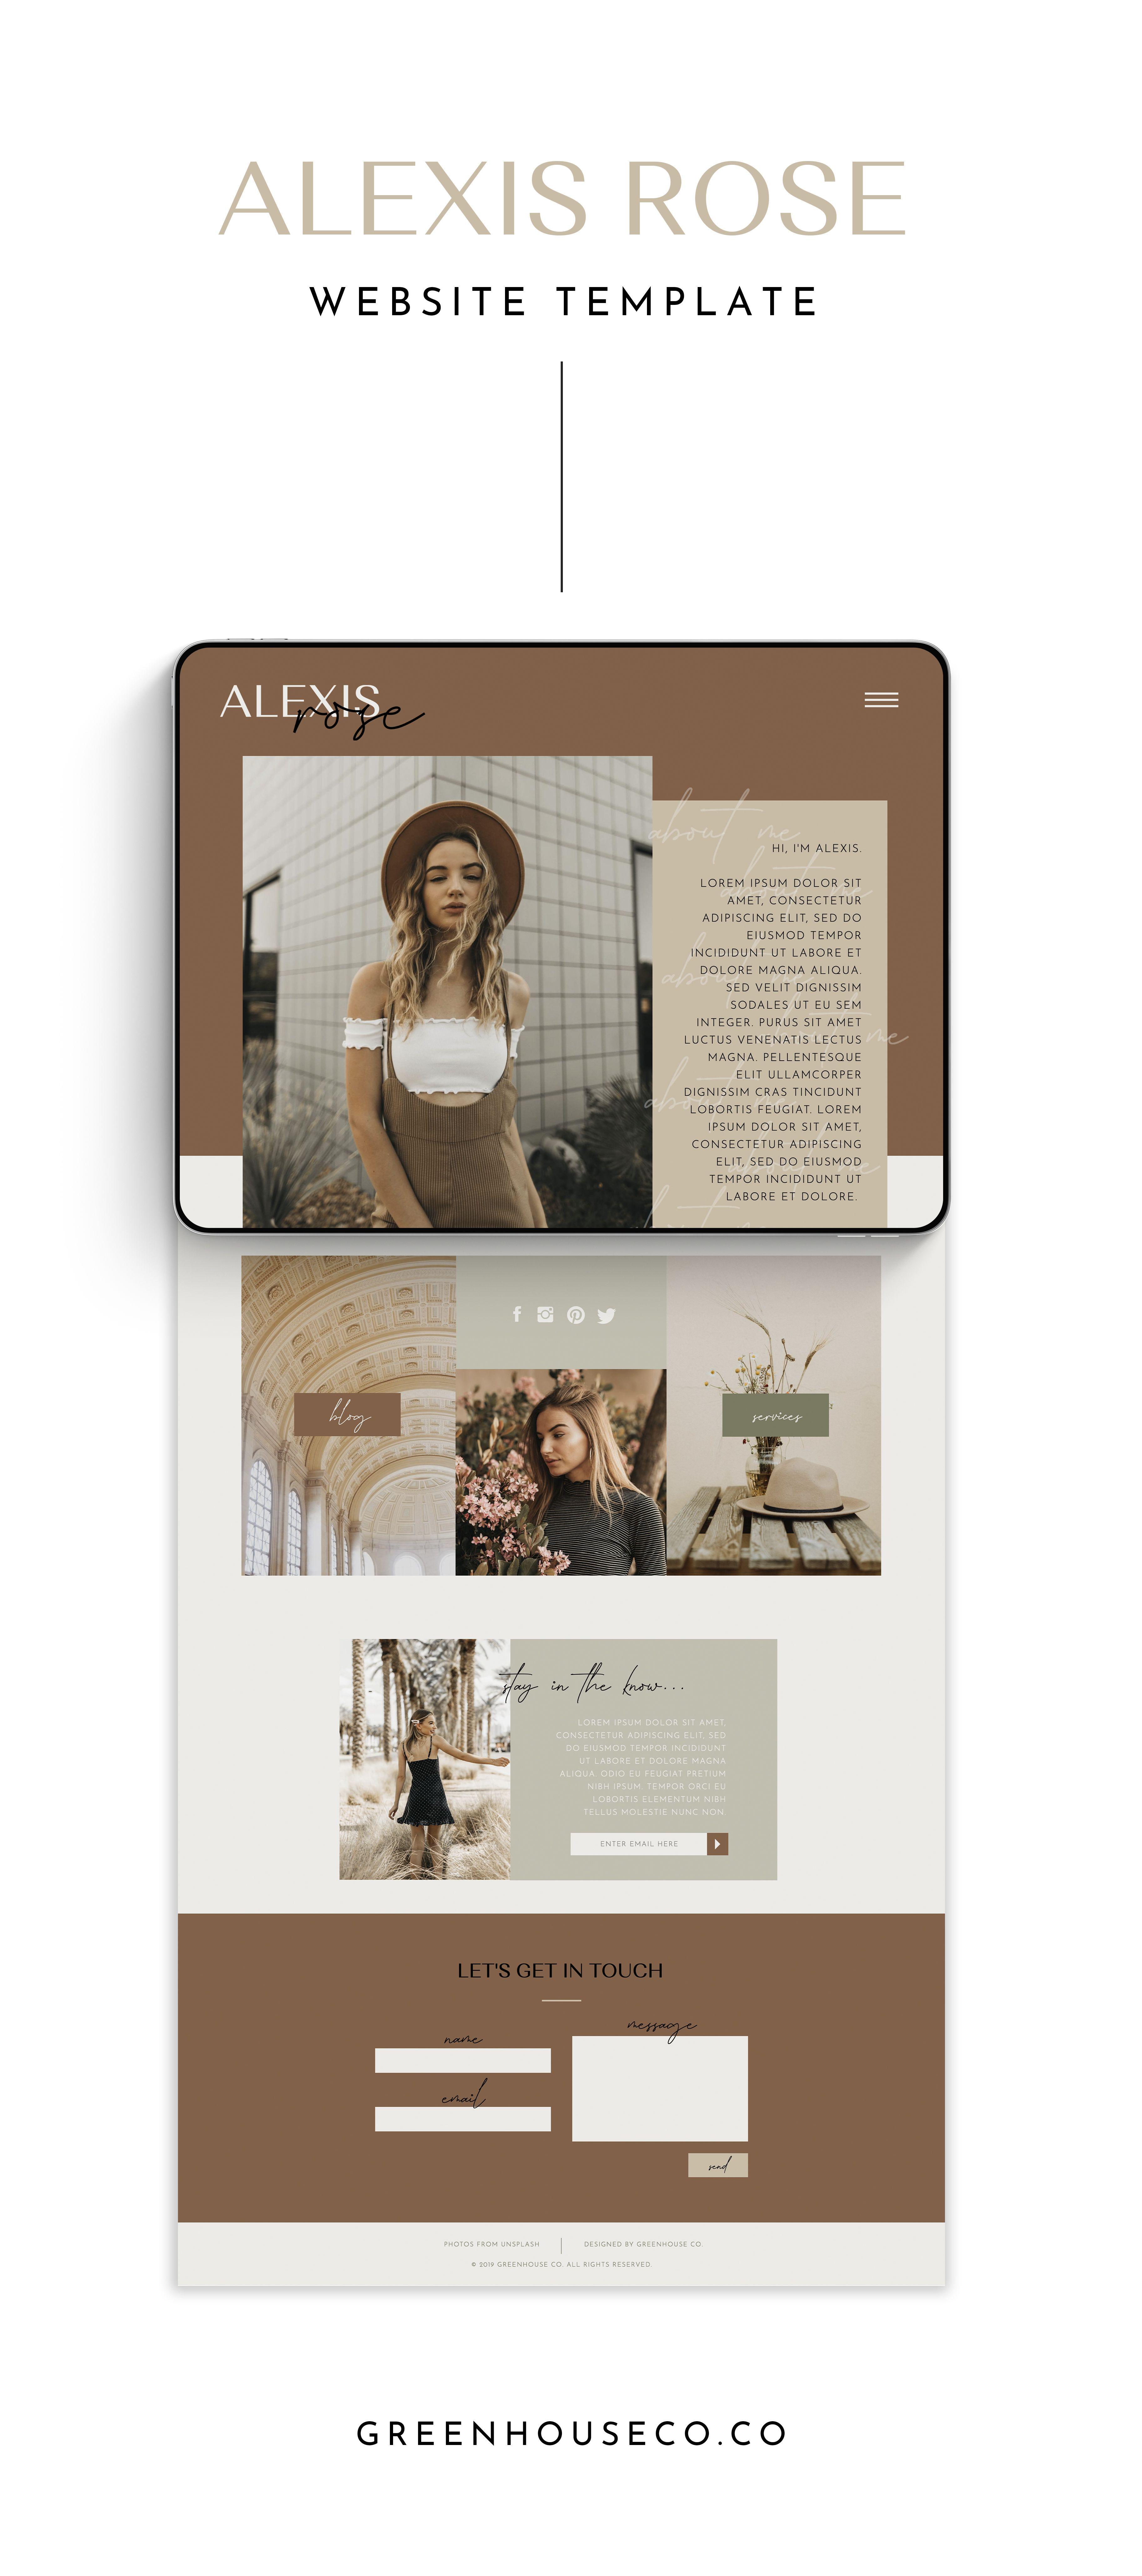 Alexis Rose Easy To Use Website Templates Website Design Inspiration Business Website Design Small Business Website Design